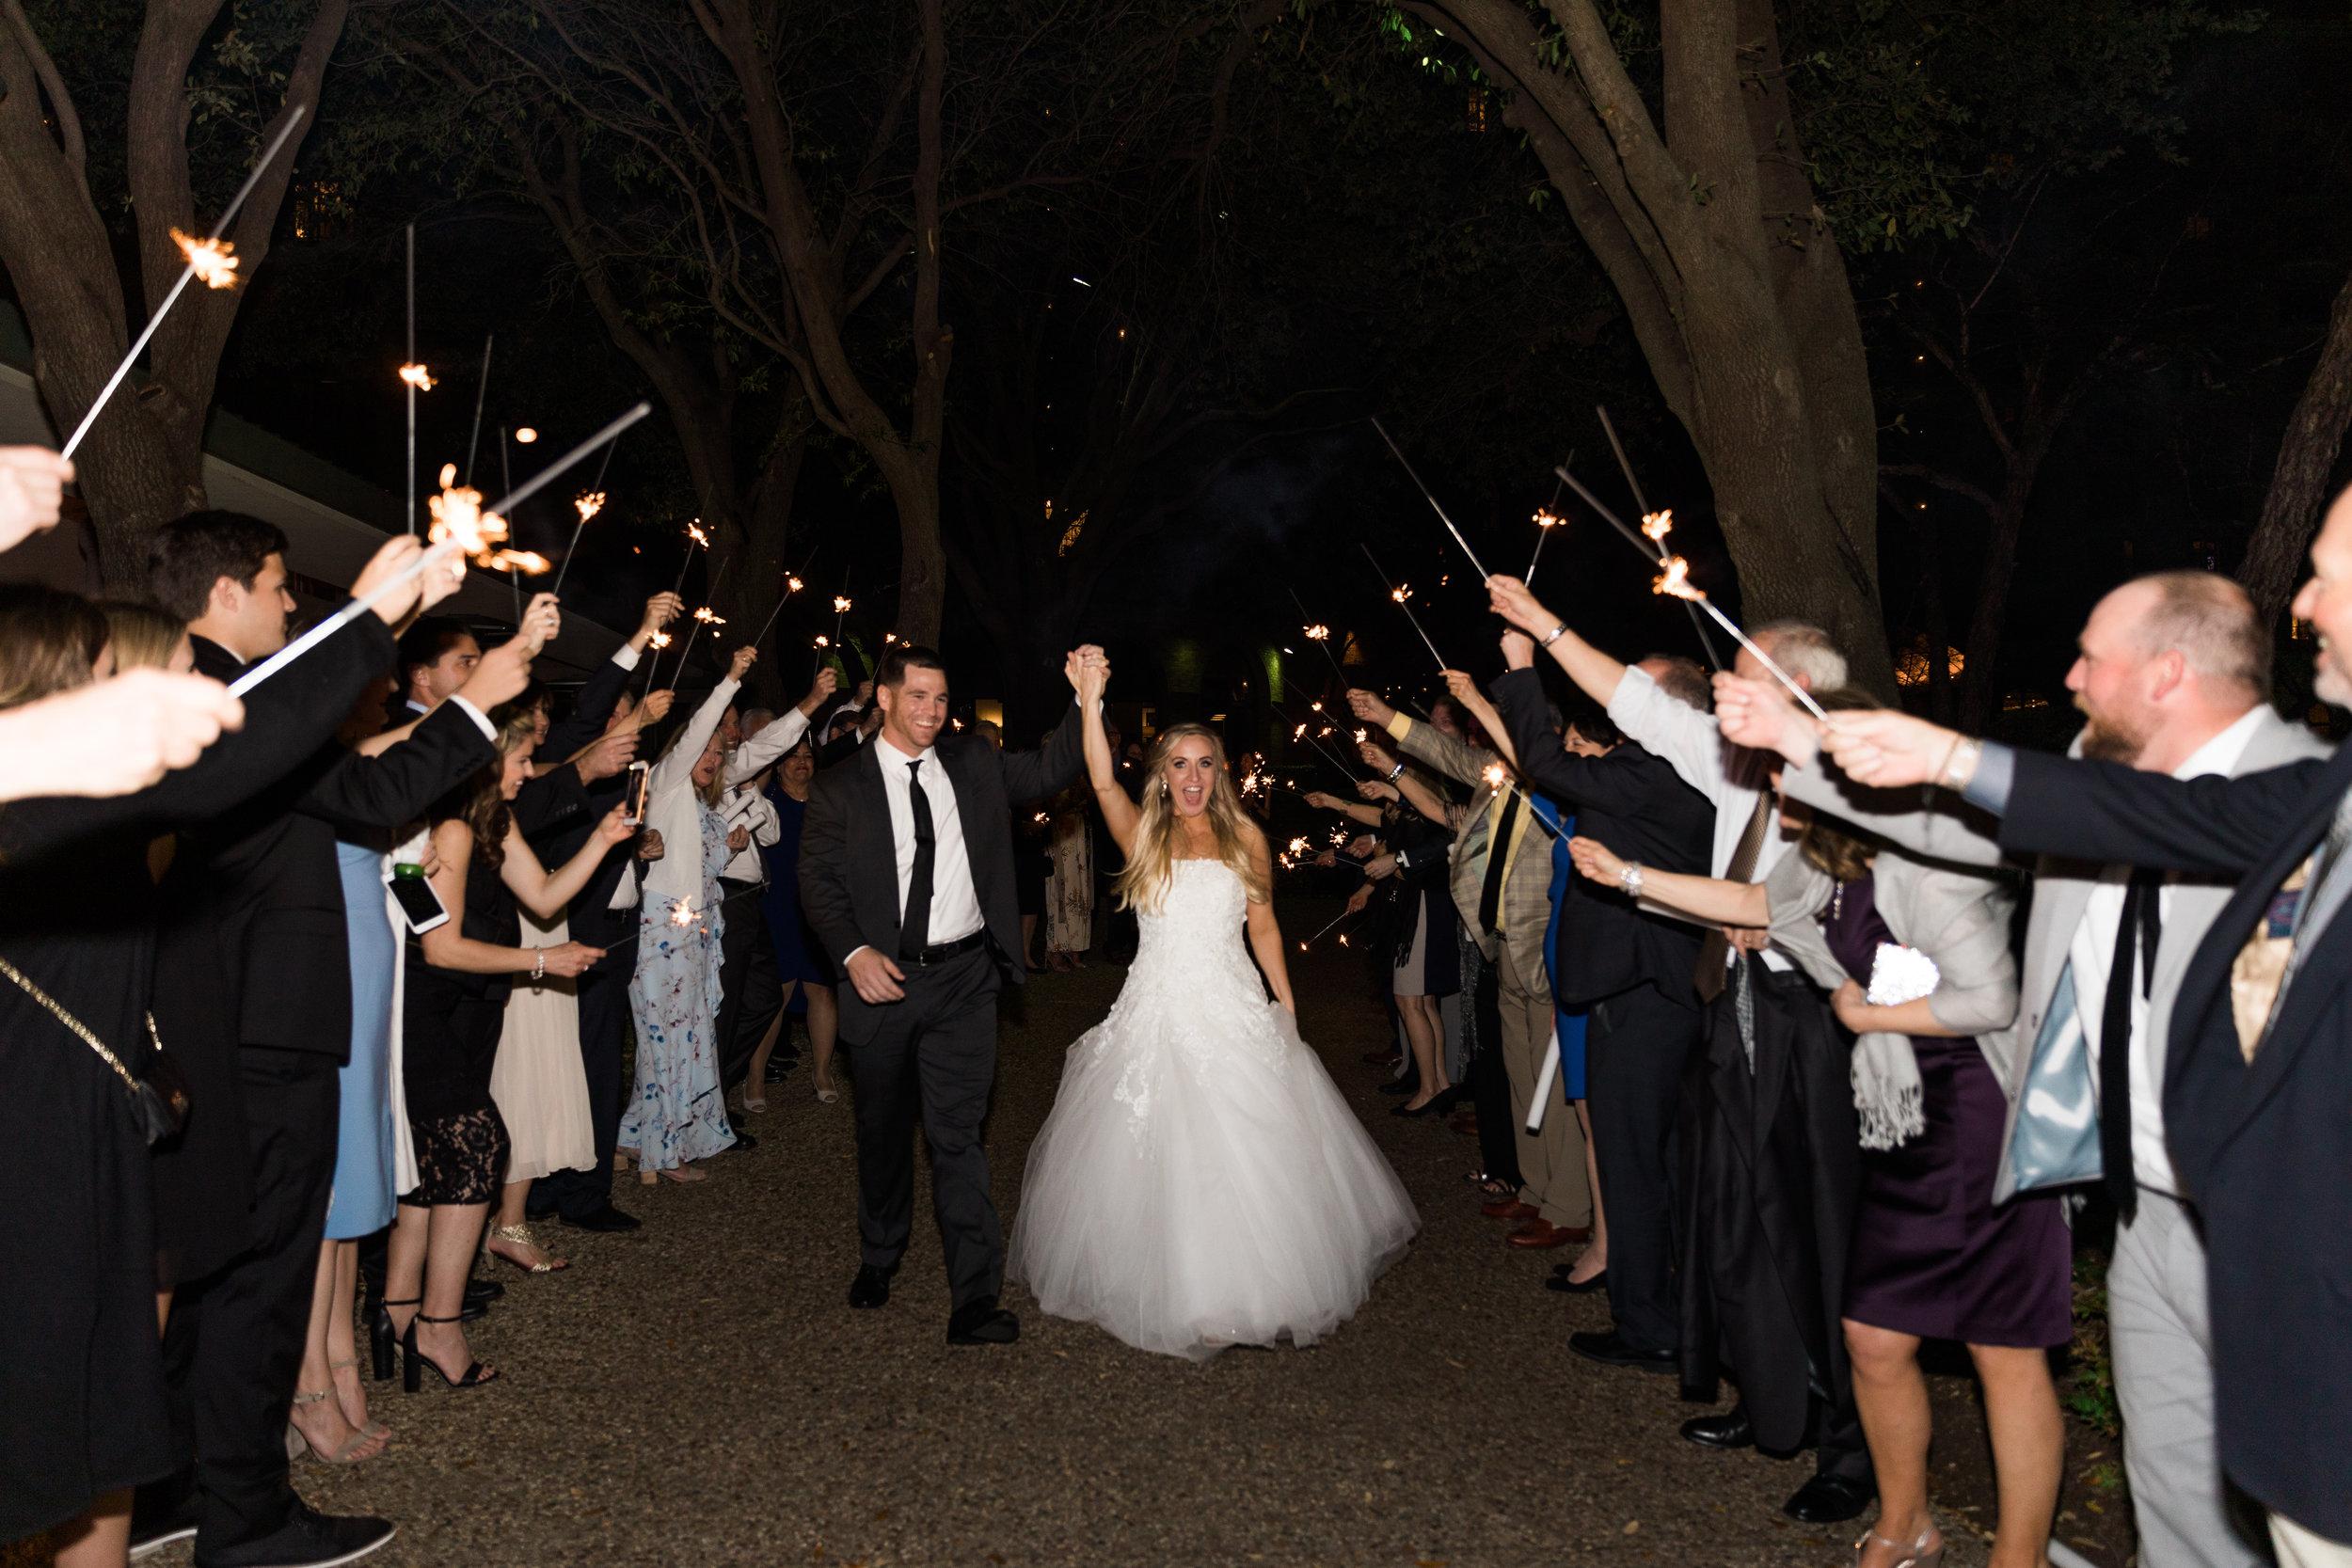 DFW Wedding Planner - Caroline + Jeff at The Four Seasons Hotel Wedding - Allday Events - 209.jpg